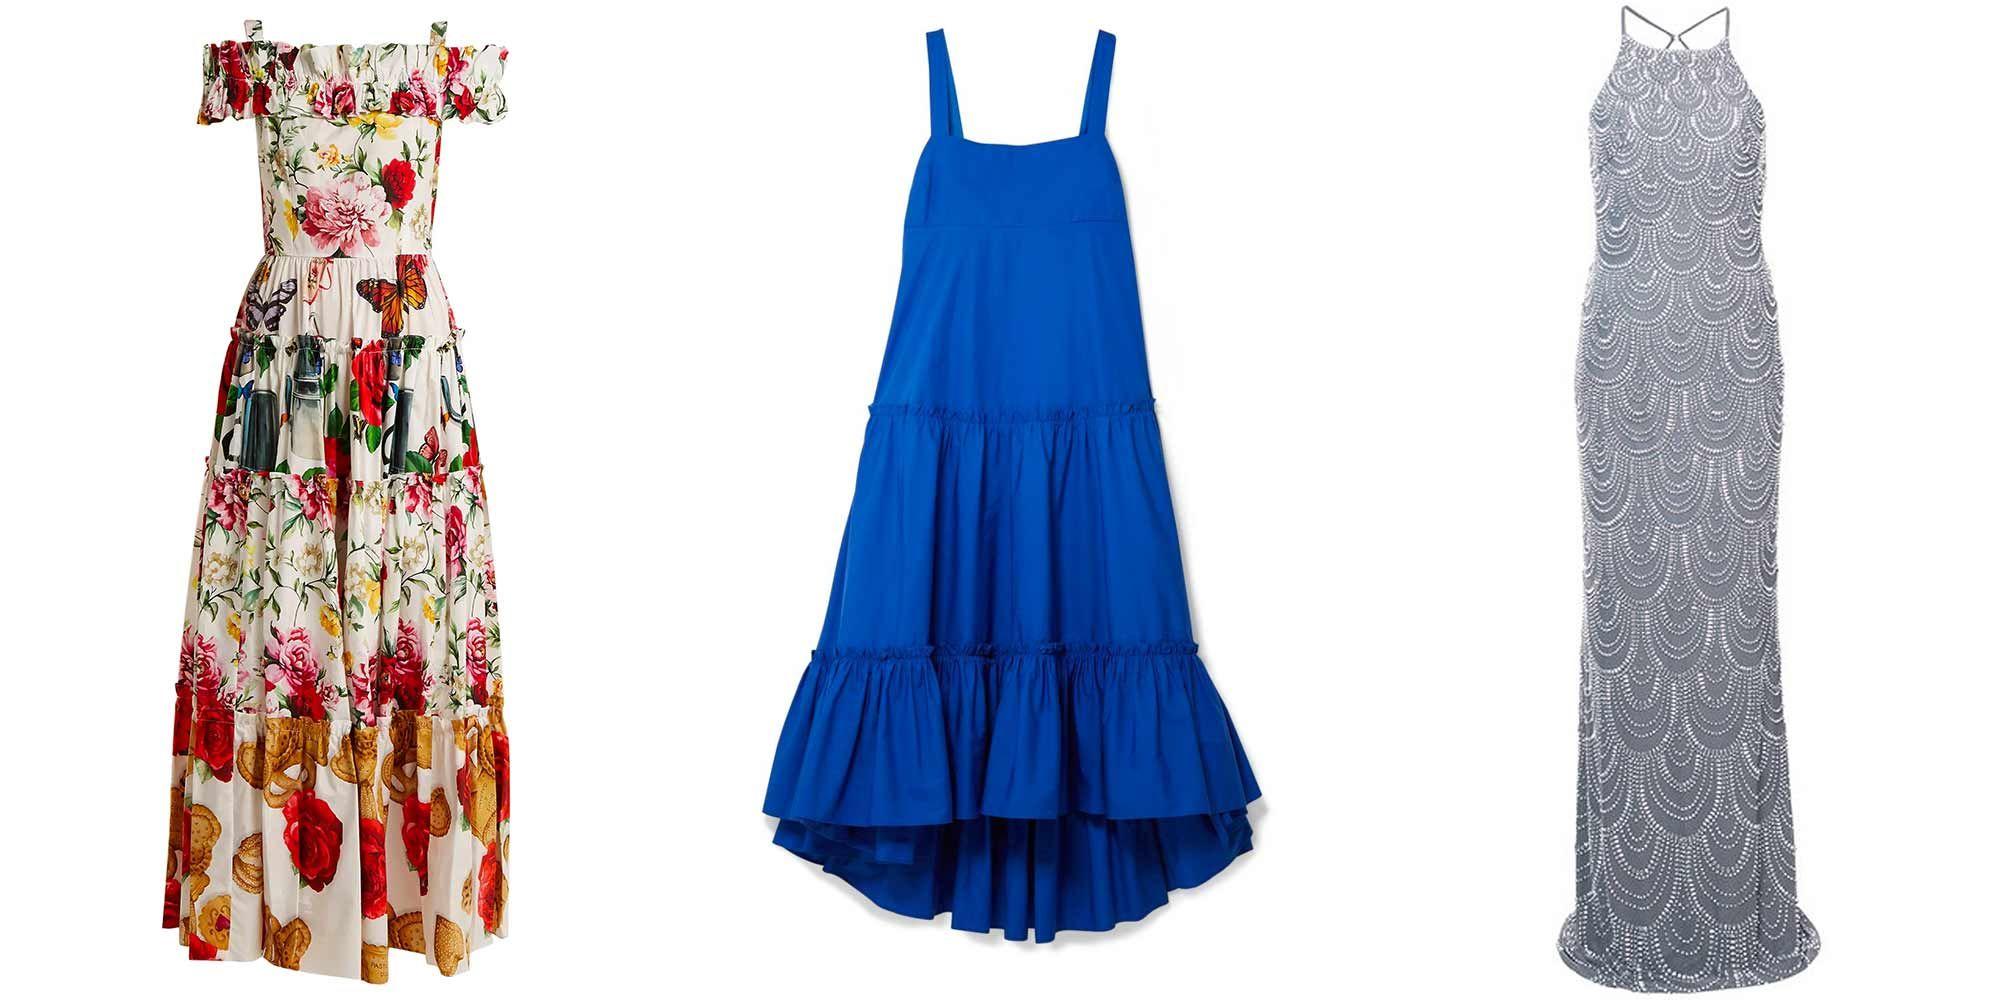 What To Wear To A Summer 2018 Wedding 25 Stylish Summer Wedding